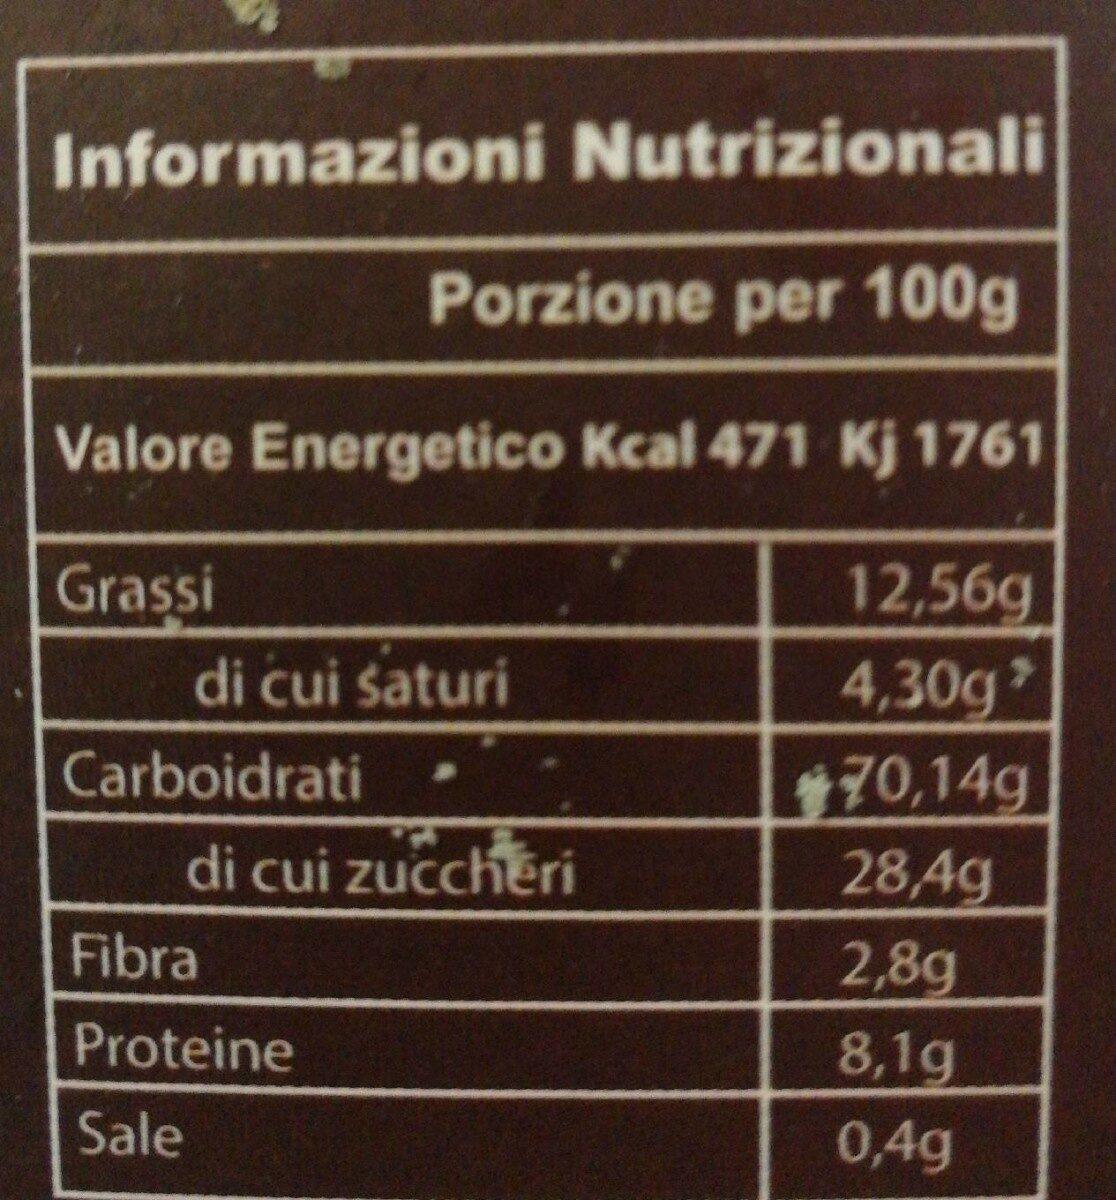 Cantucci siciliani con pistacchi - Voedingswaarden - fr